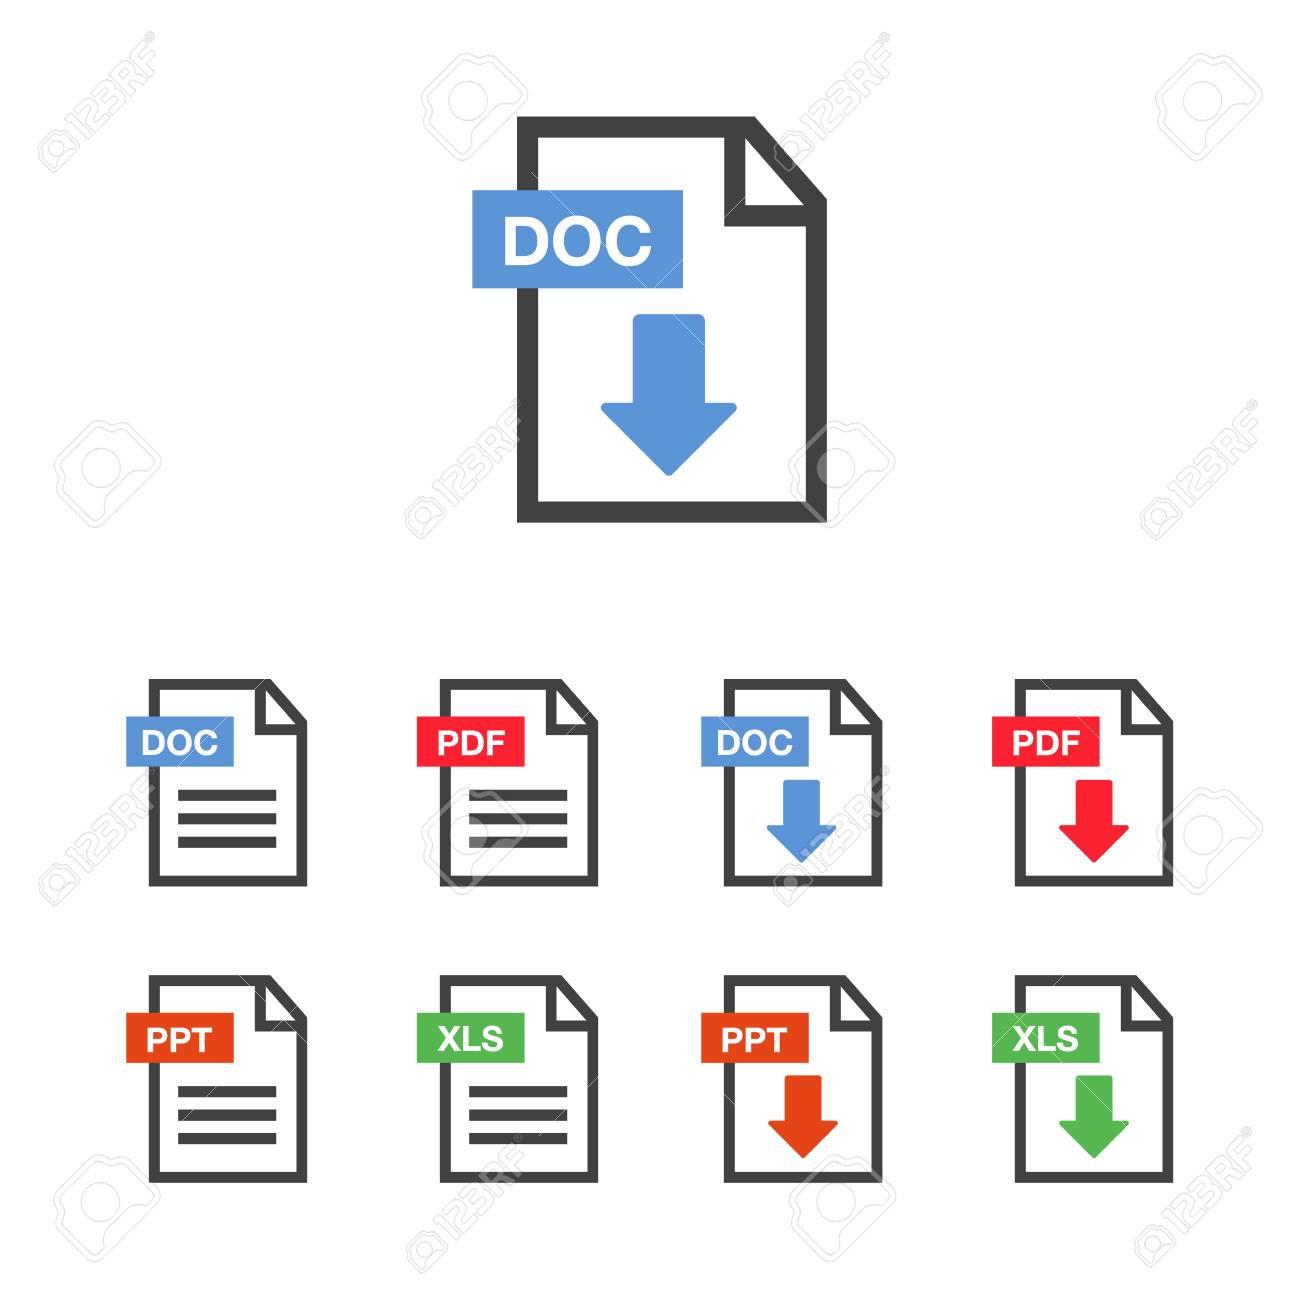 Document icon set  File Icons  PDF file download icon